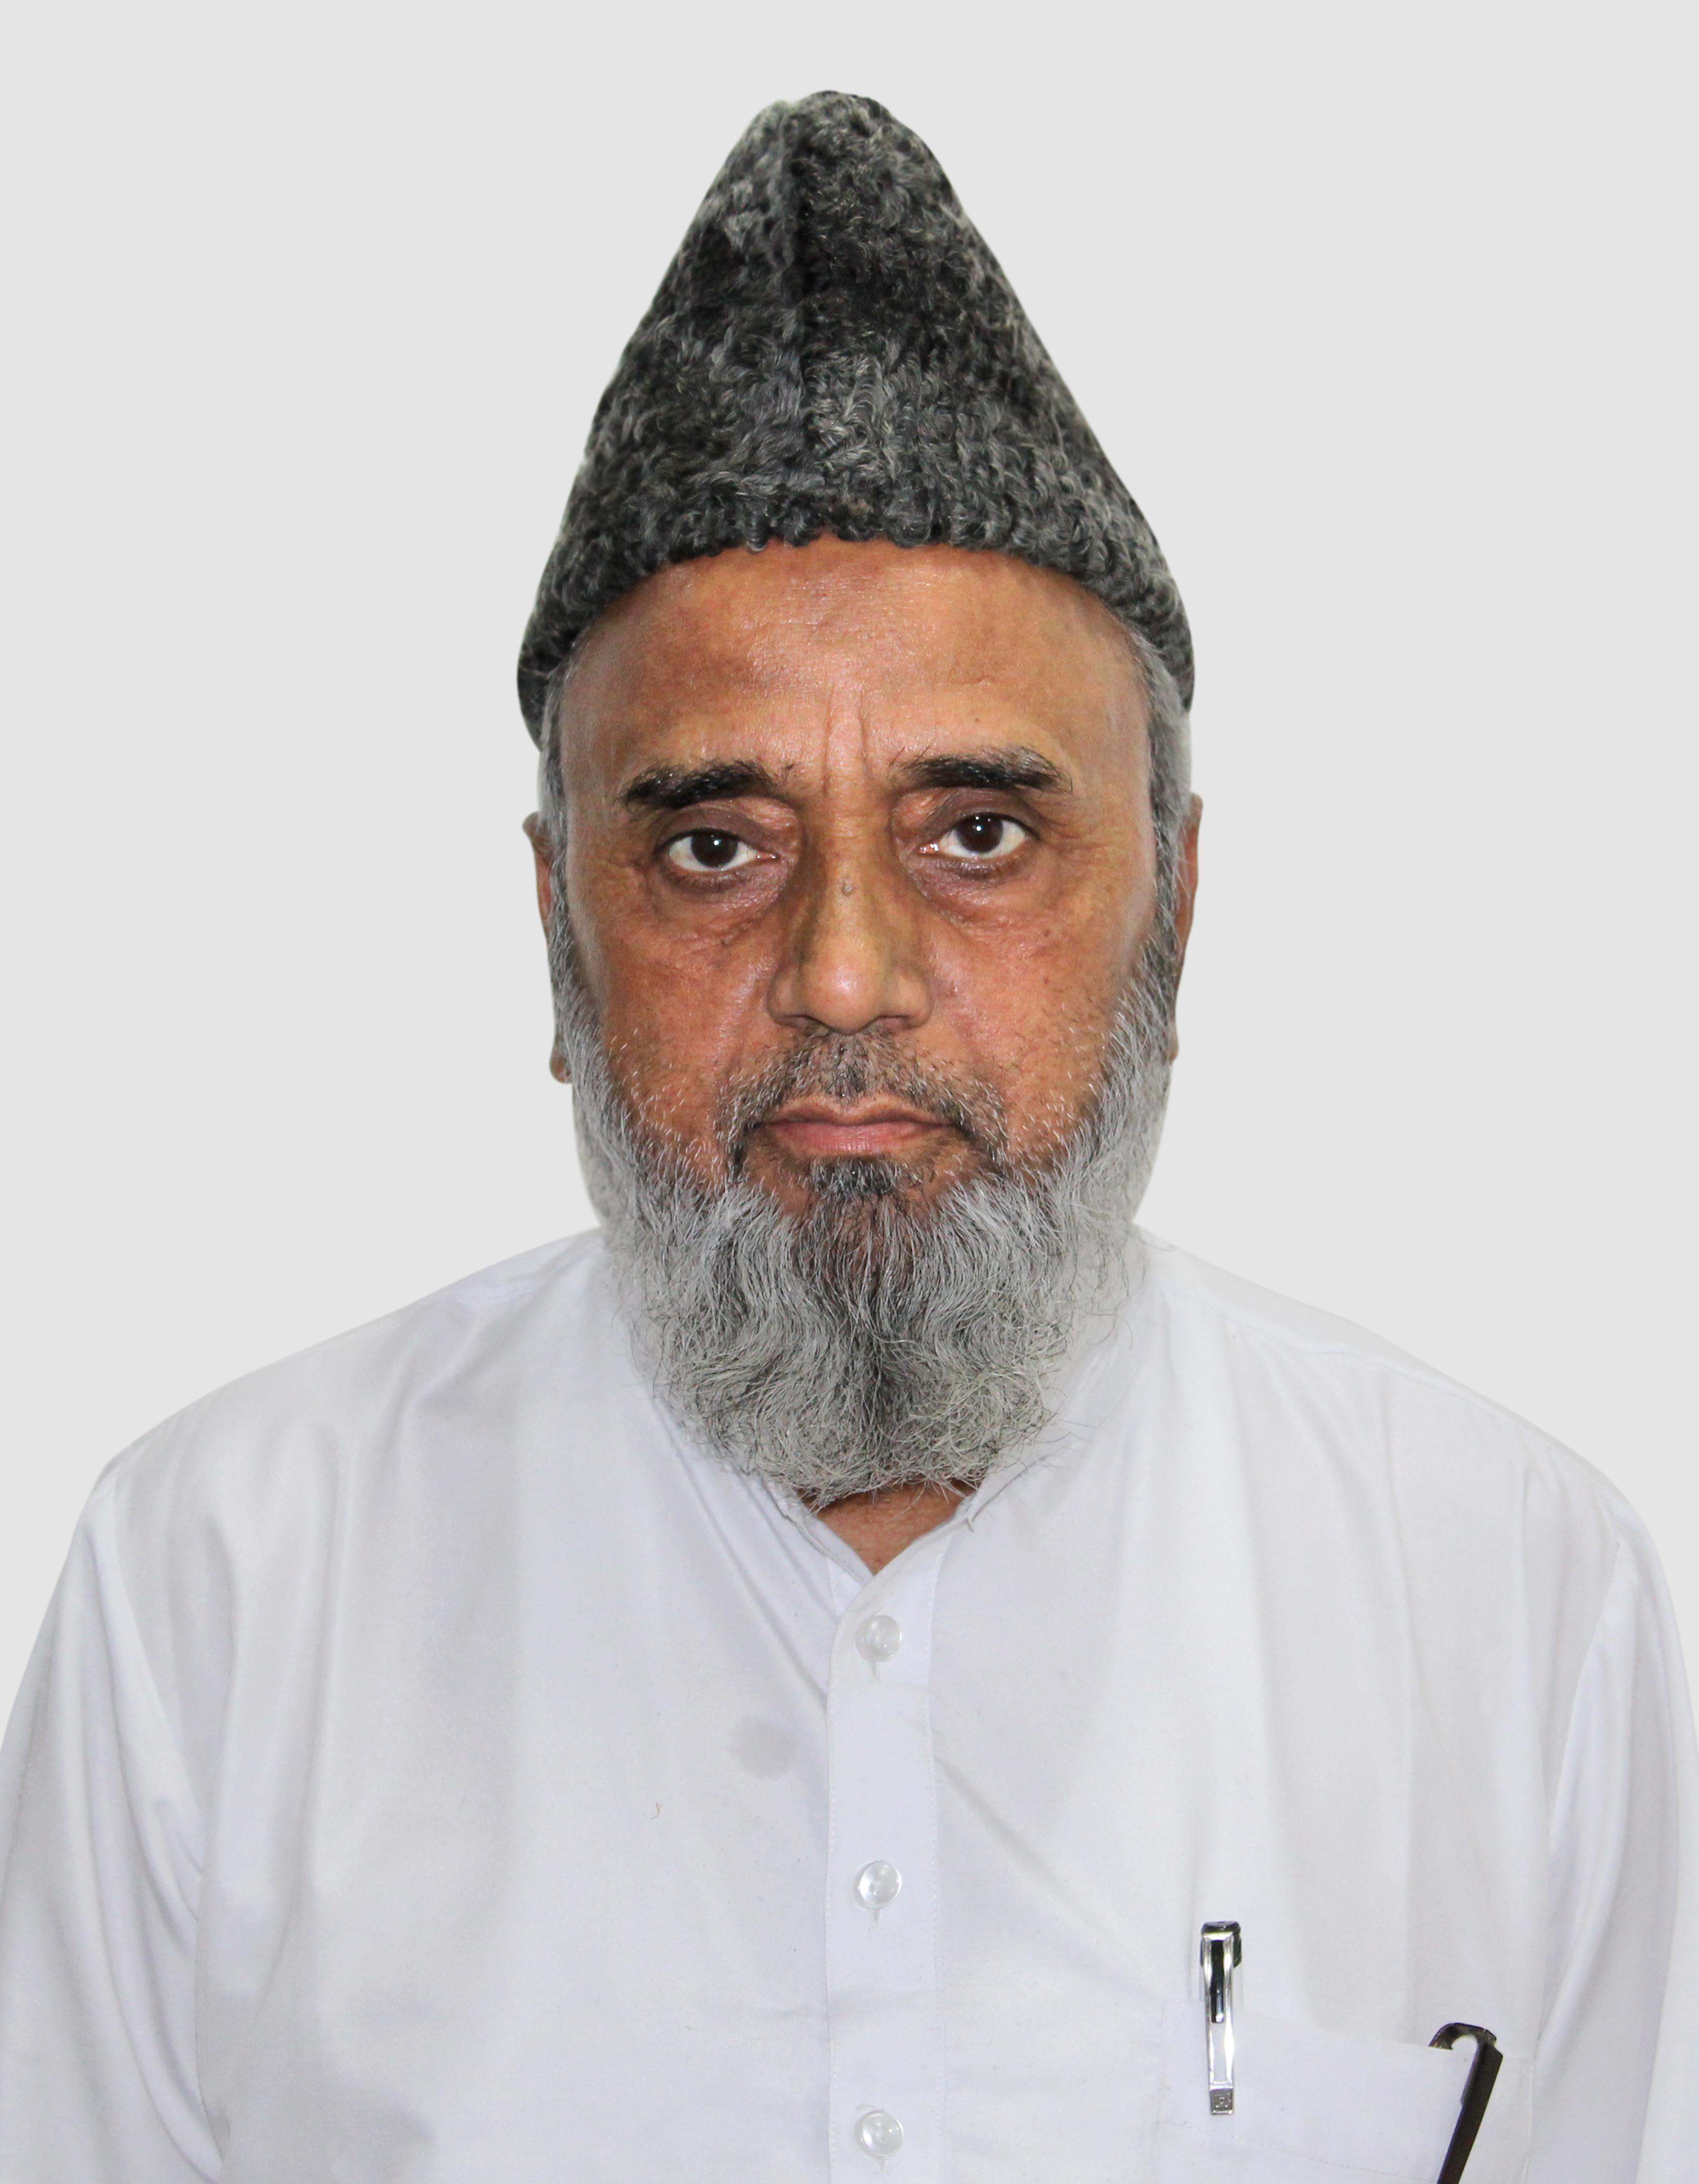 mohd nazimuddin